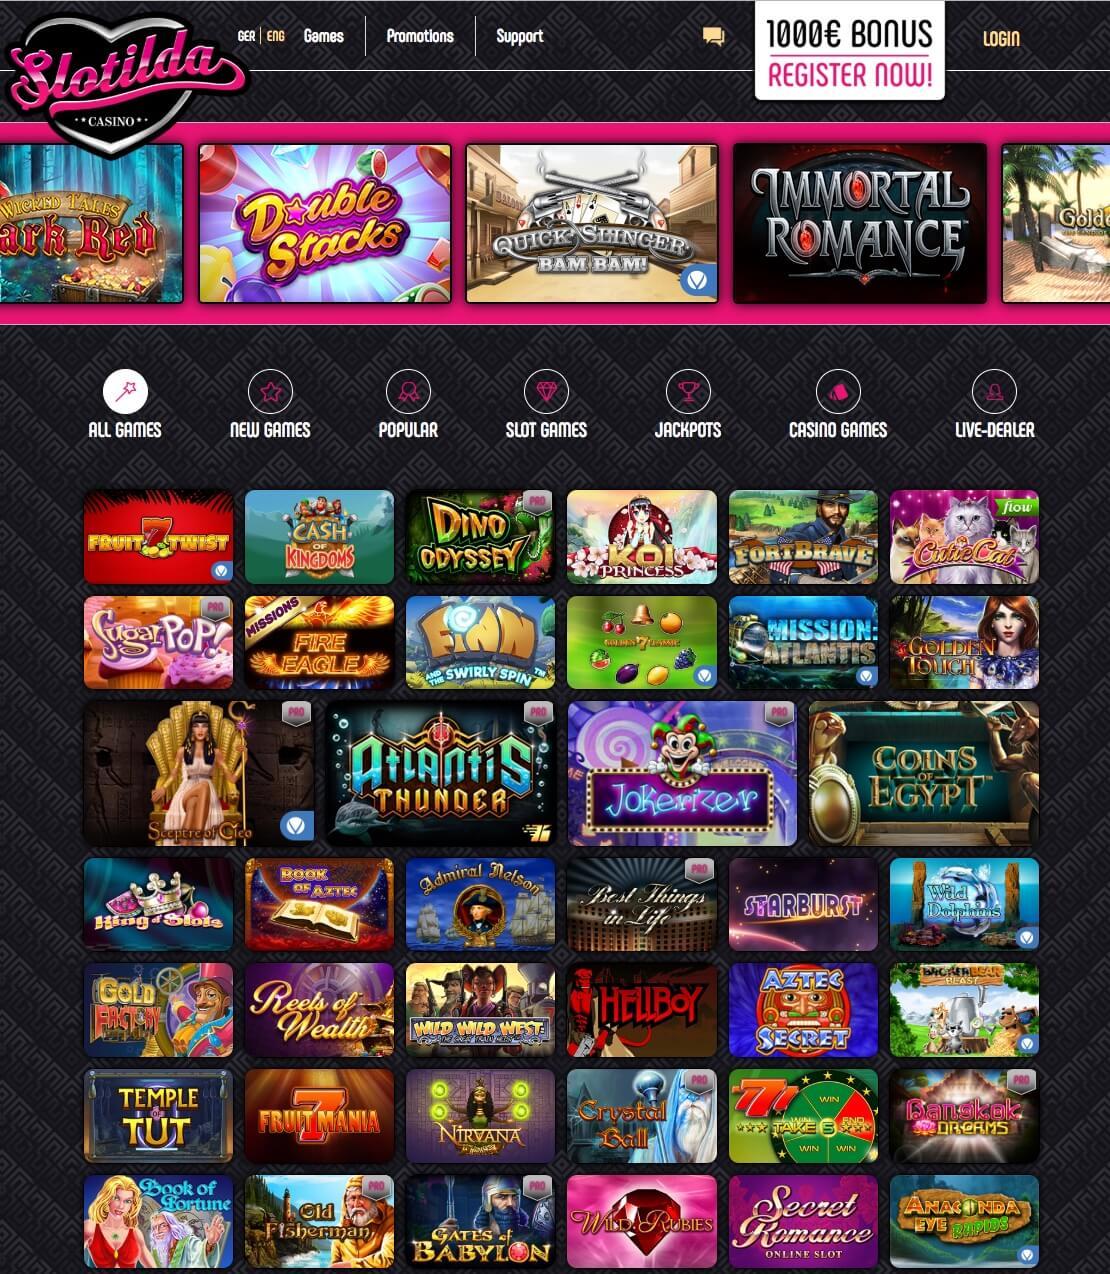 Slotilda Casino Bonus Codes 2021